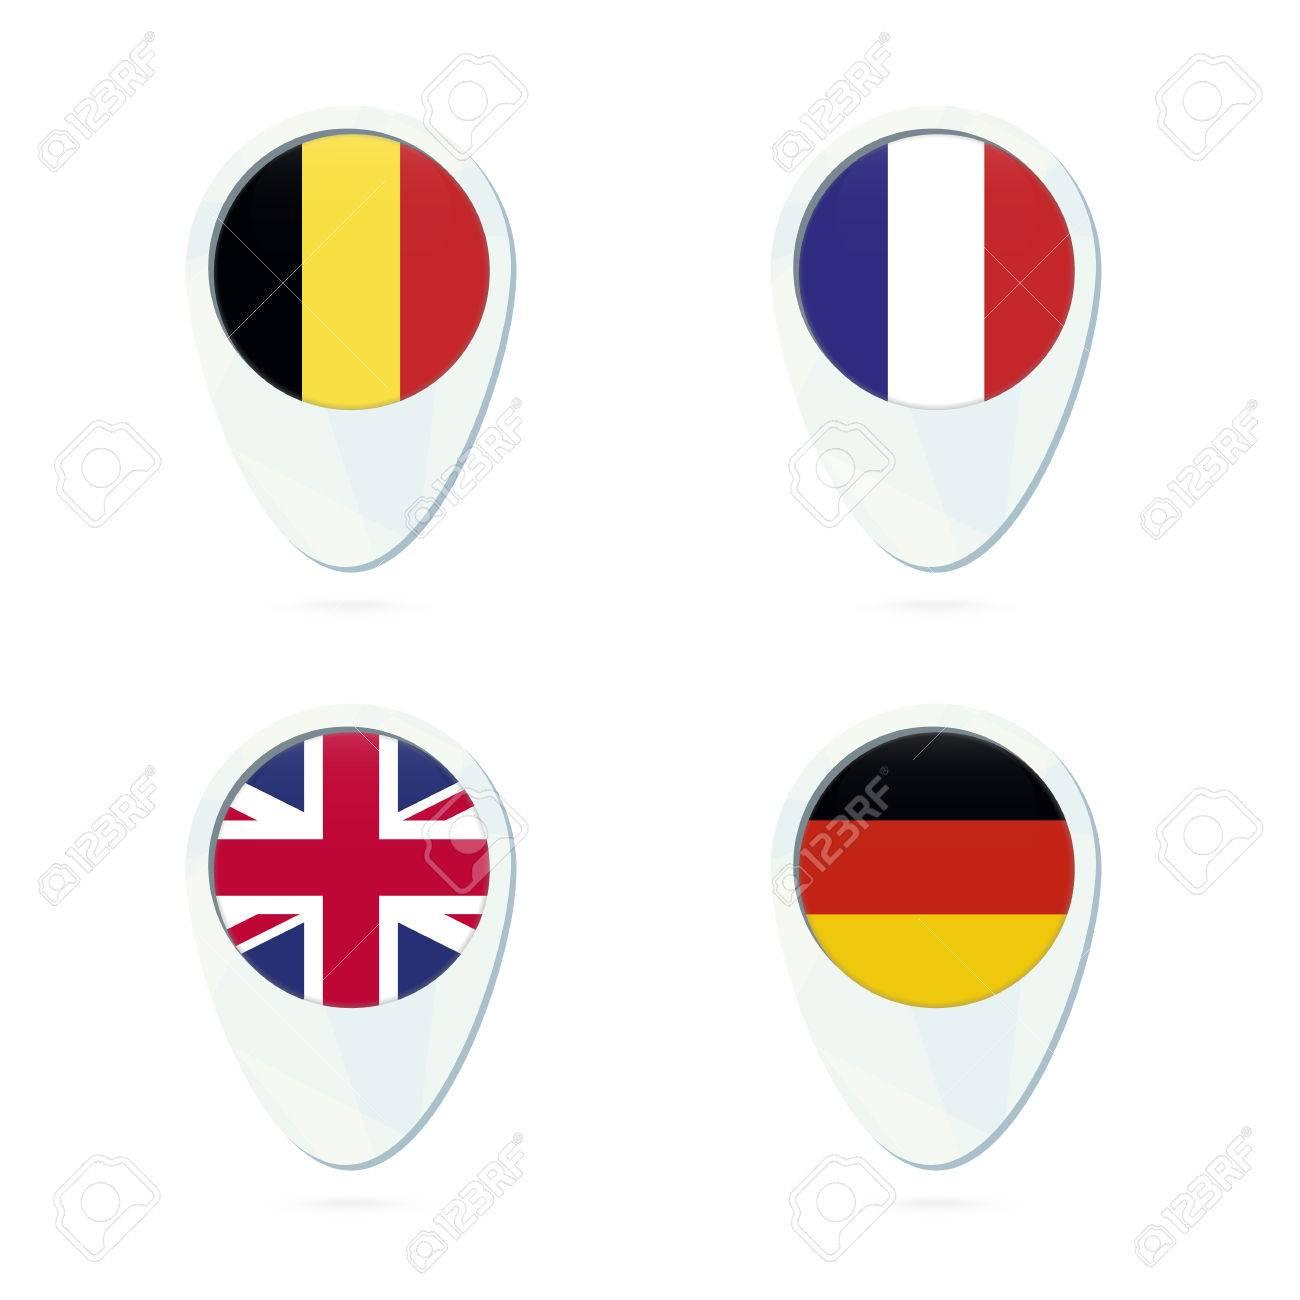 belgium france united kingdom germany flag location map pin icon belgium flag